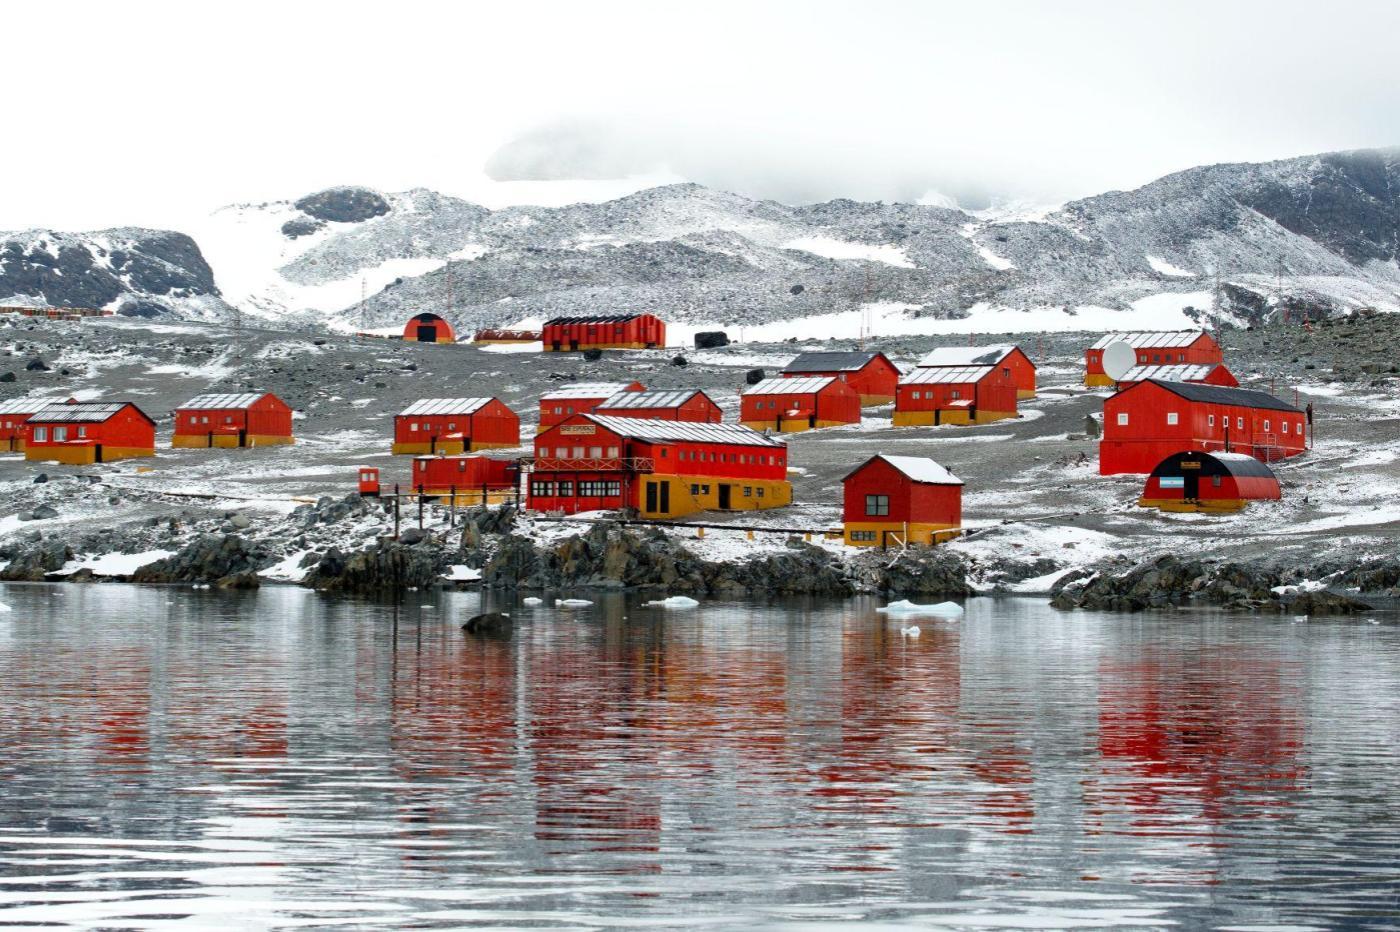 Un record de chaleur homologué en Antarctique continentale